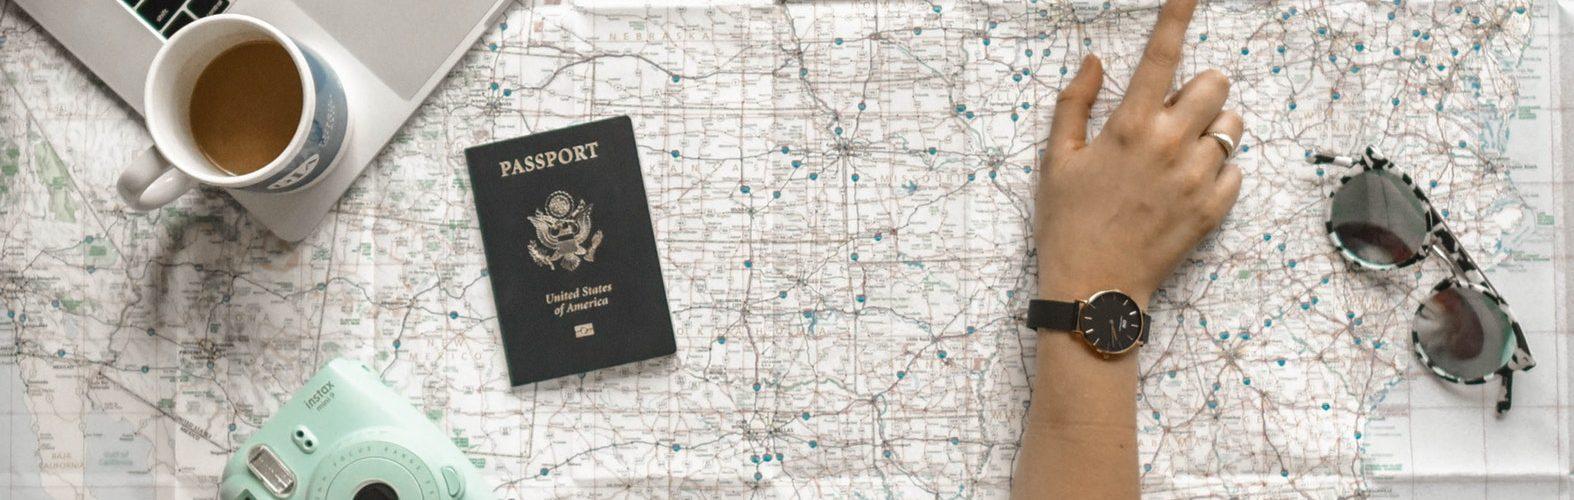 reiskaart